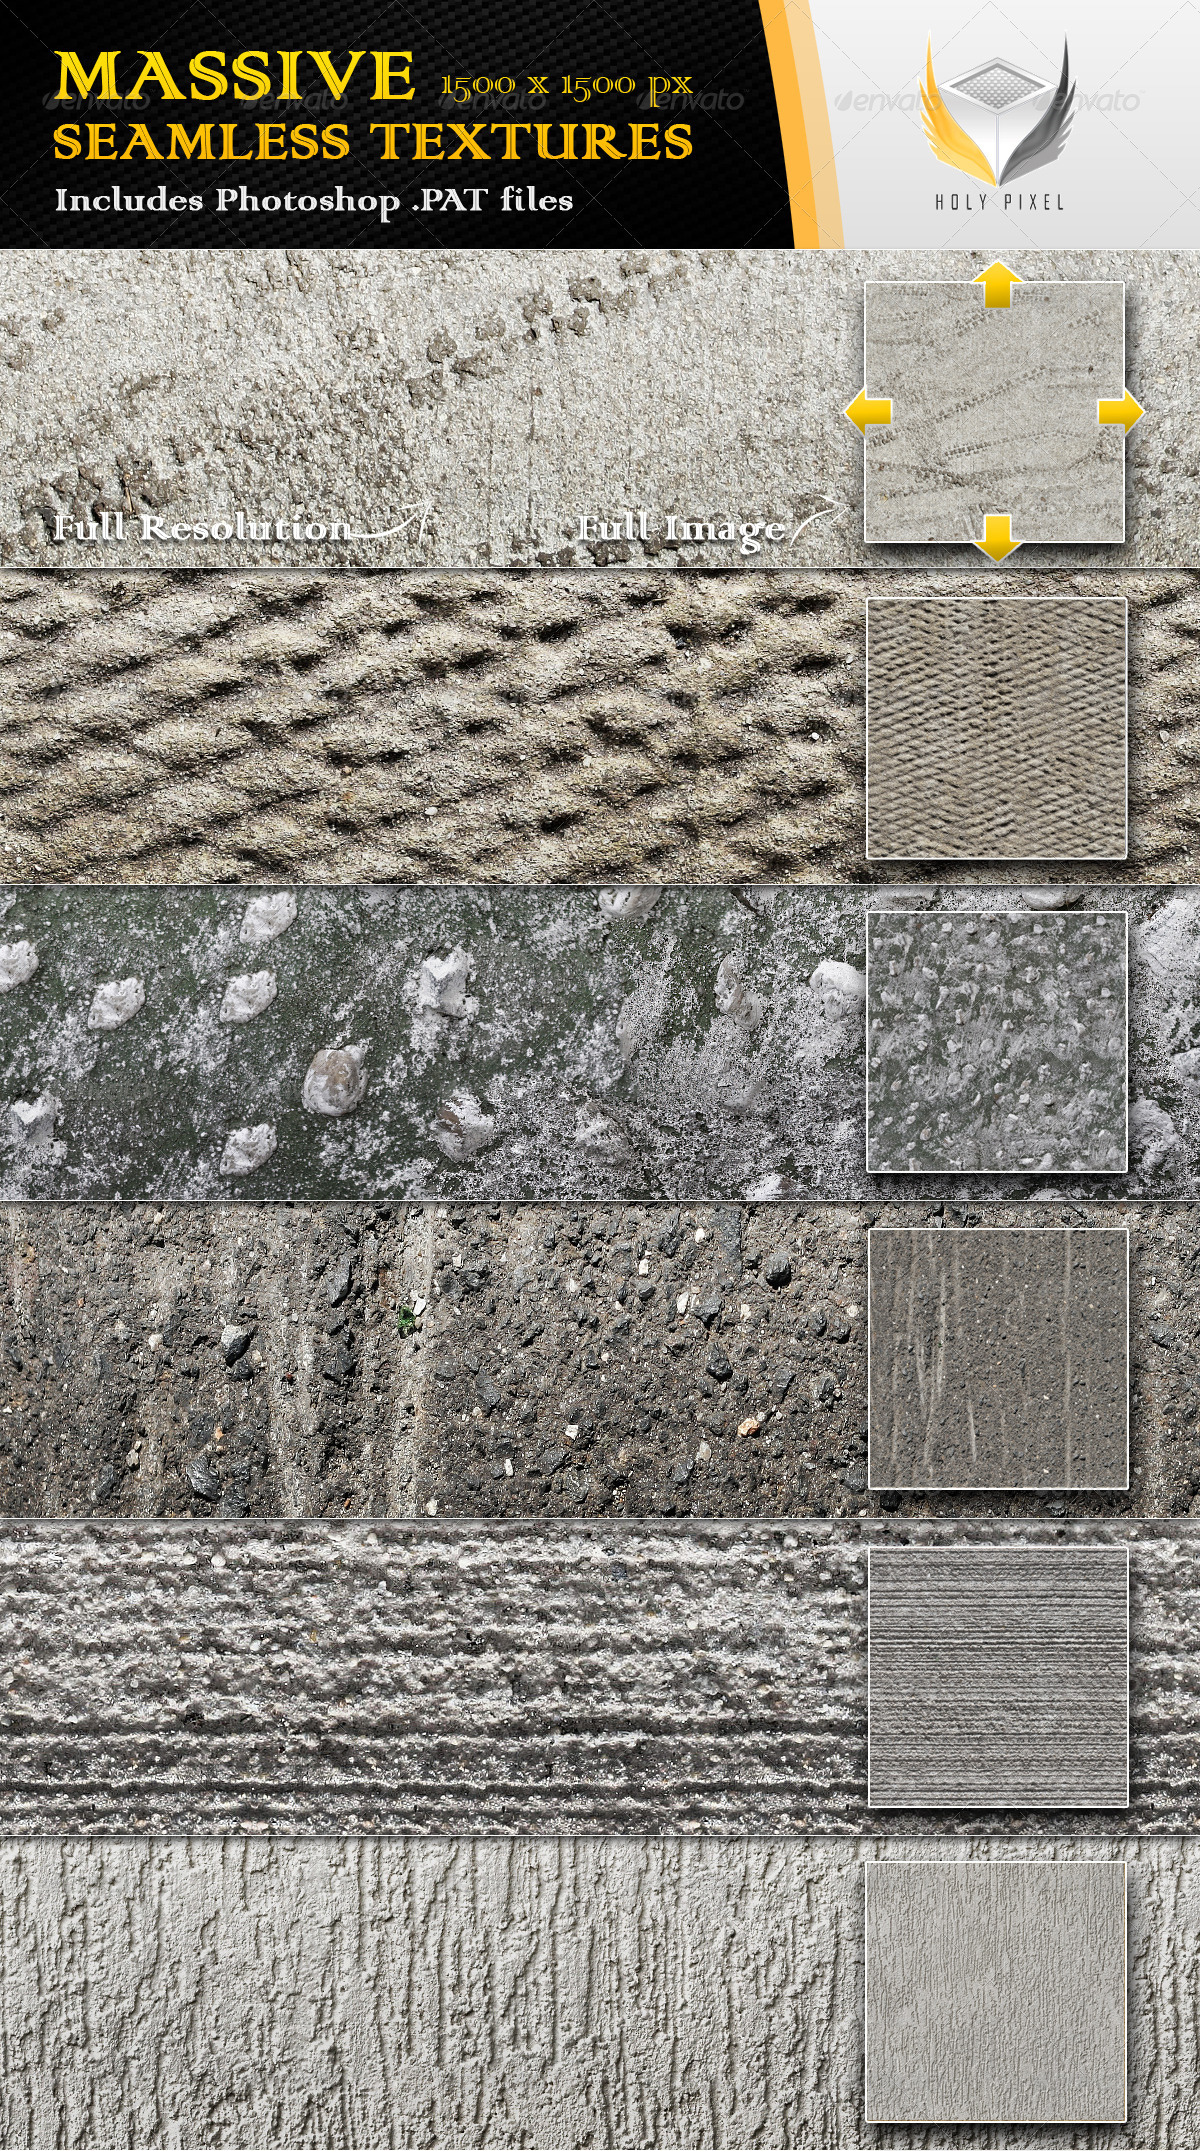 6 Seamless Concrete Textures 2 - Urban Textures / Fills / Patterns